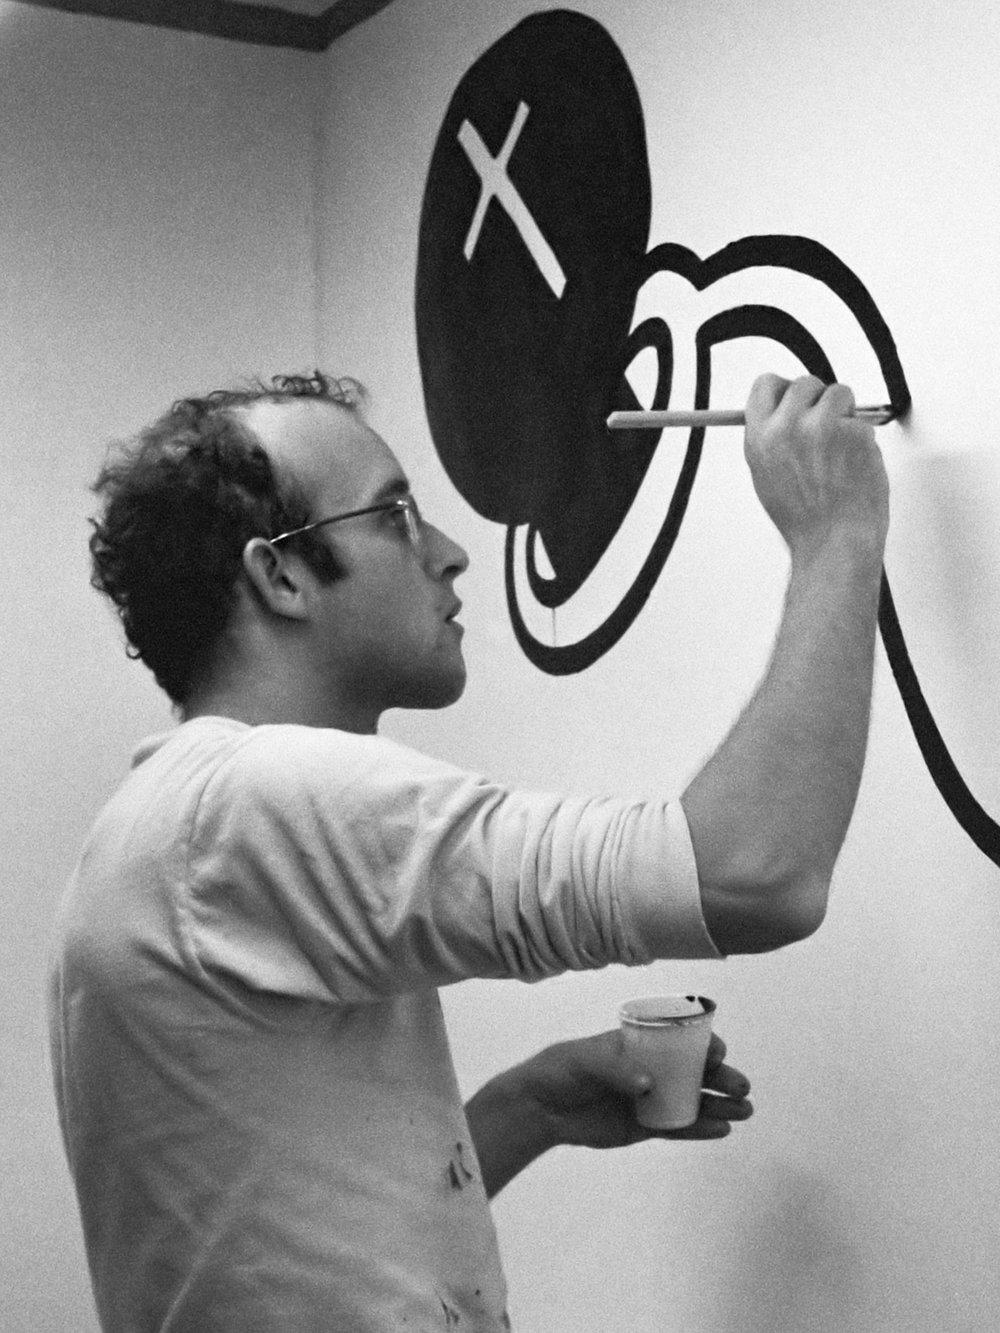 Keith_Haring_(1986).jpg